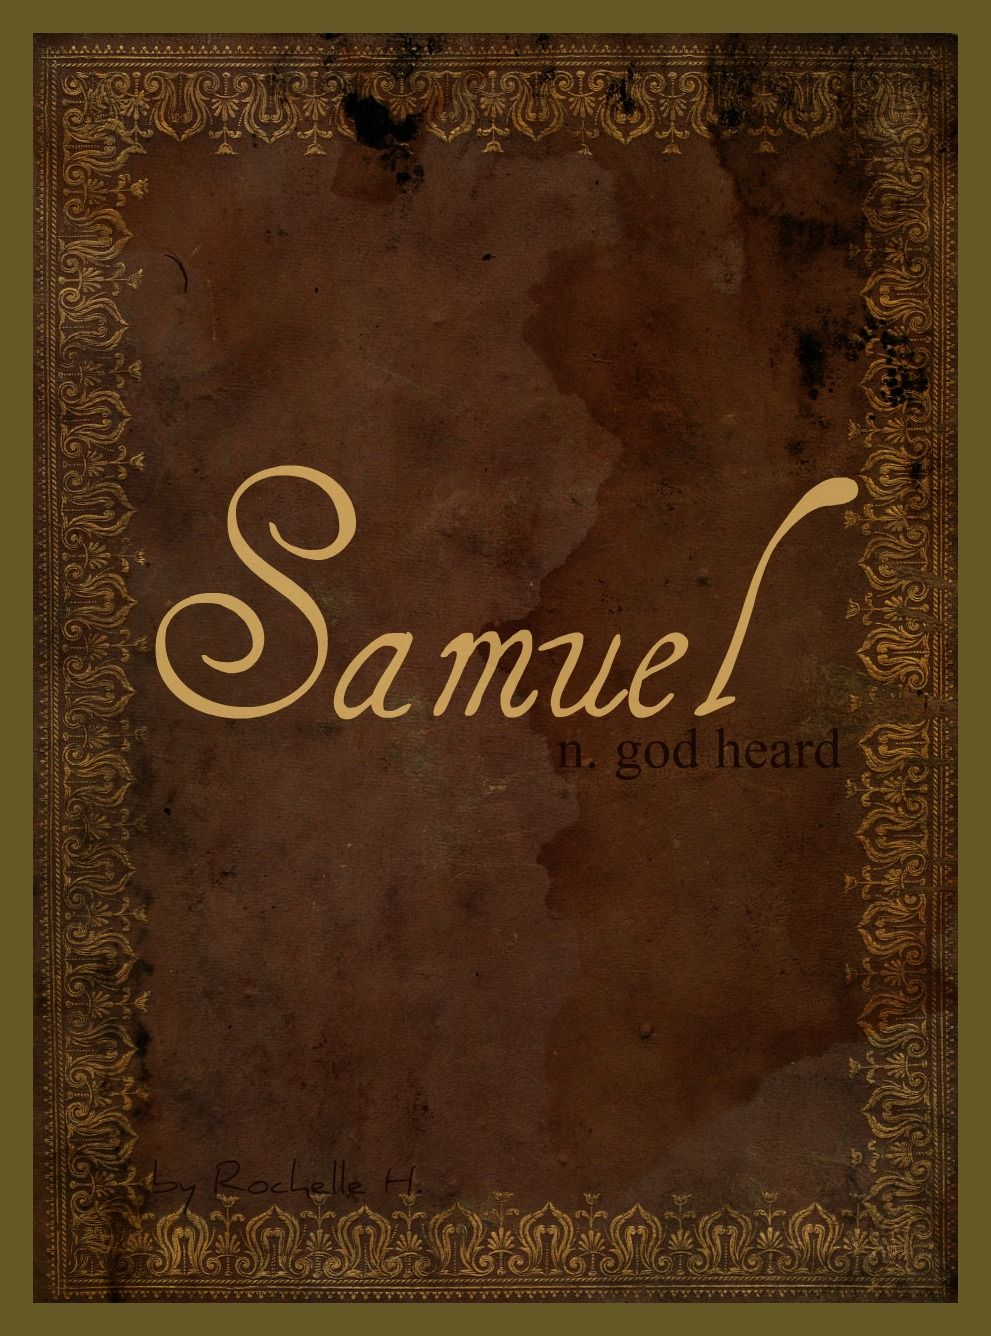 Baby Boy Name Samuel Meaning God Heard Origin Hebrew English